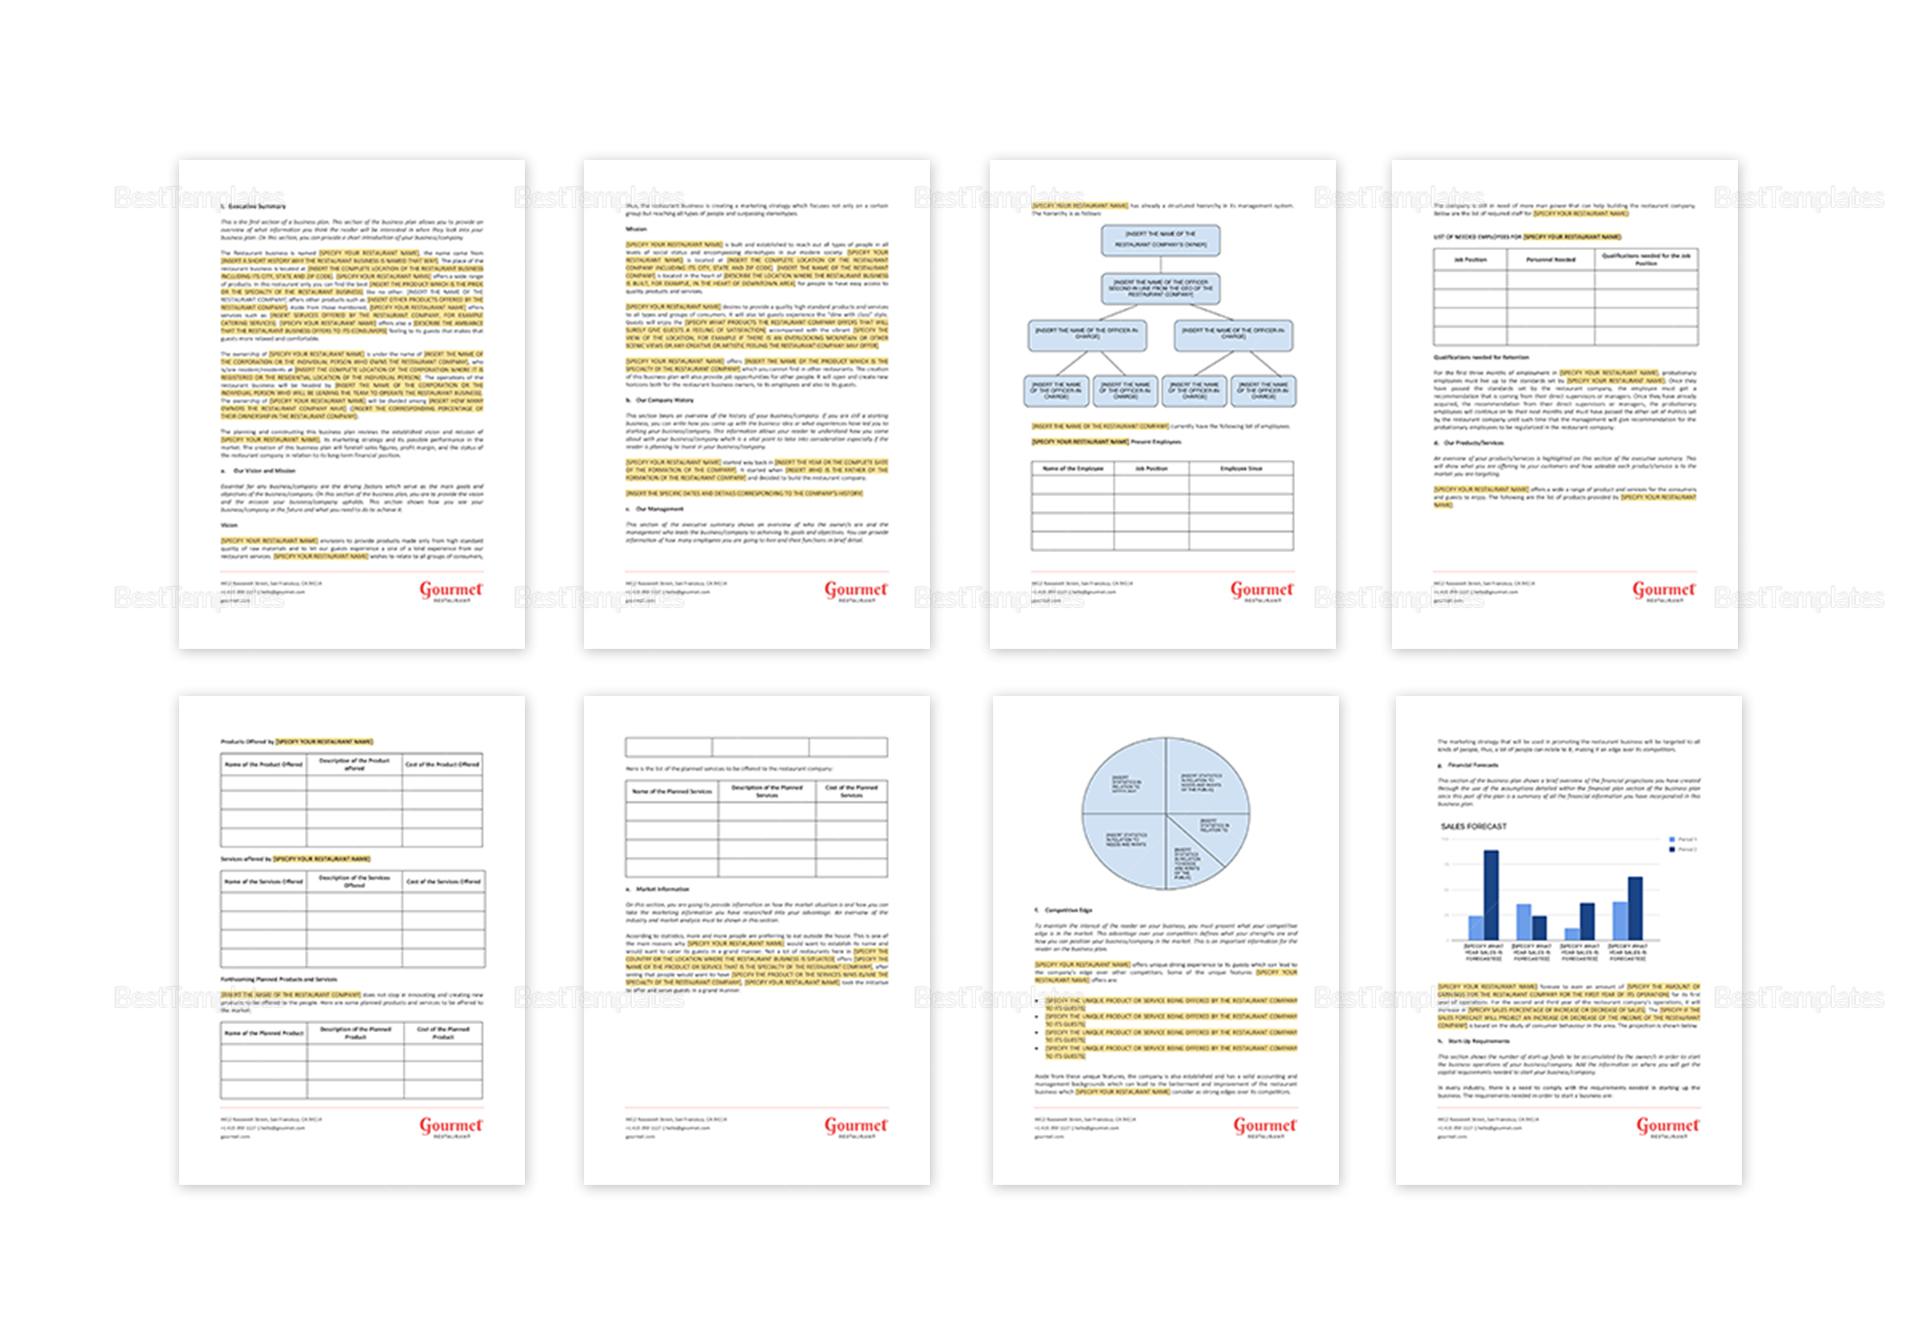 Sample Restaurant Business Plan Outline Template